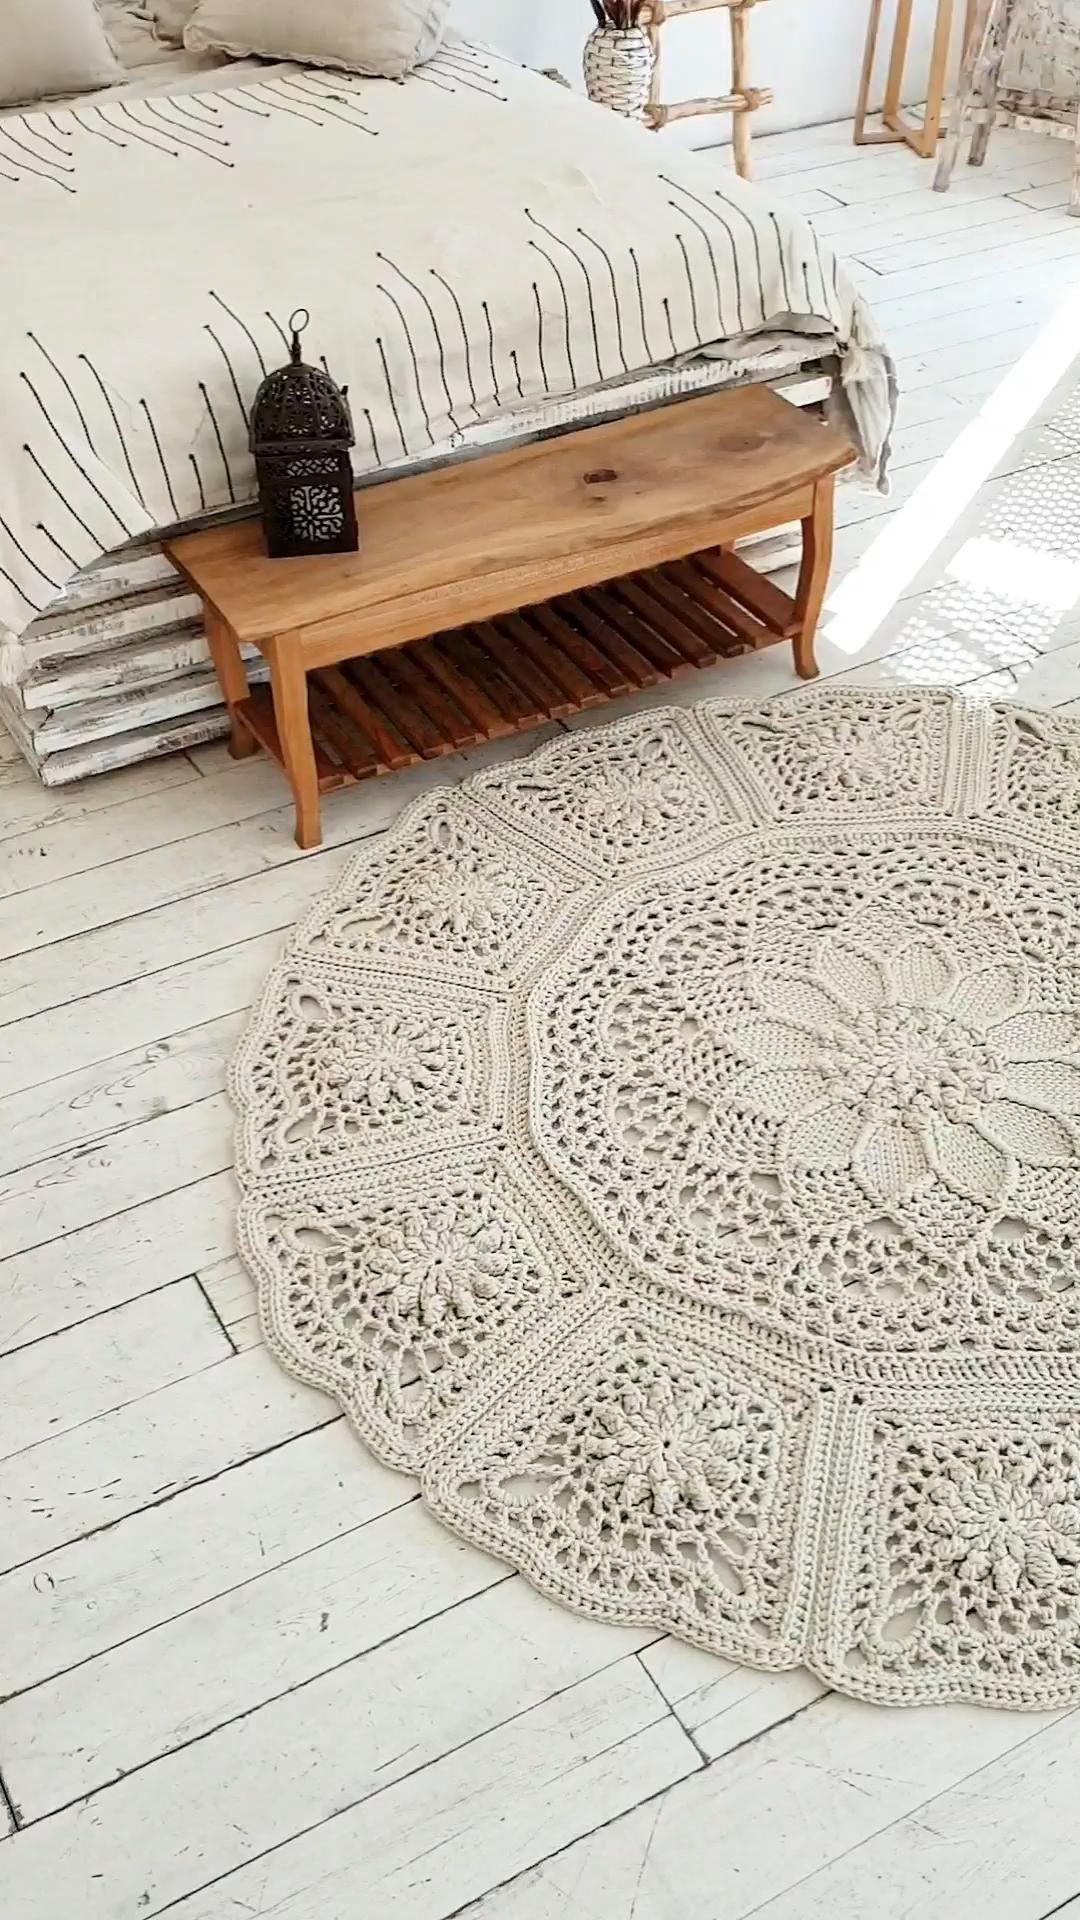 Craft home decor. Crochet rug pattern (video